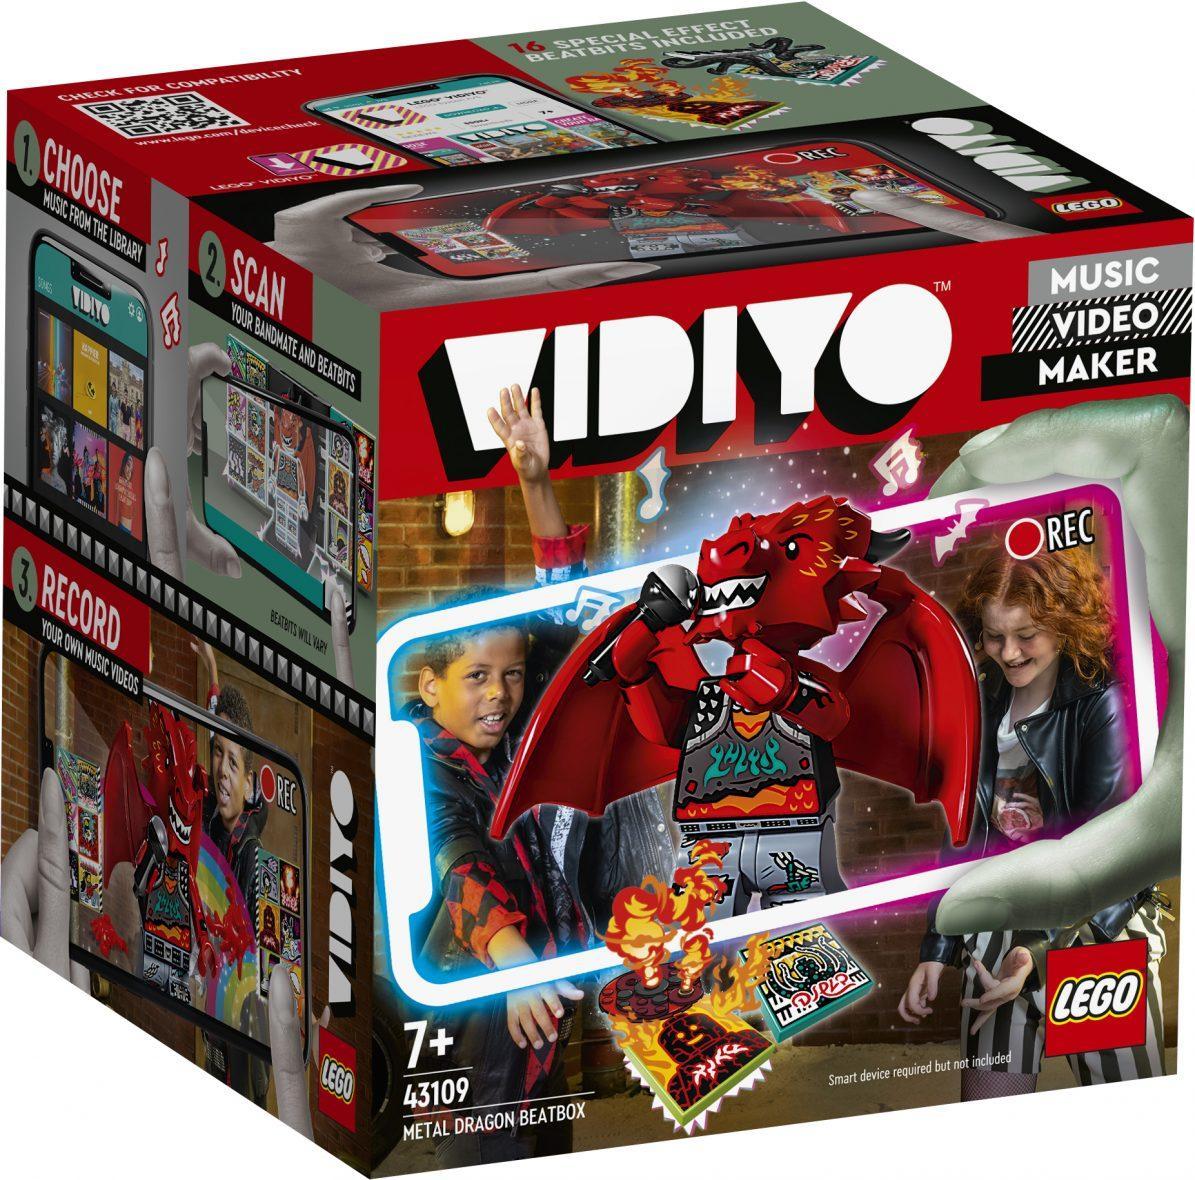 LEGO 43109 – Metal dragon BeatBox